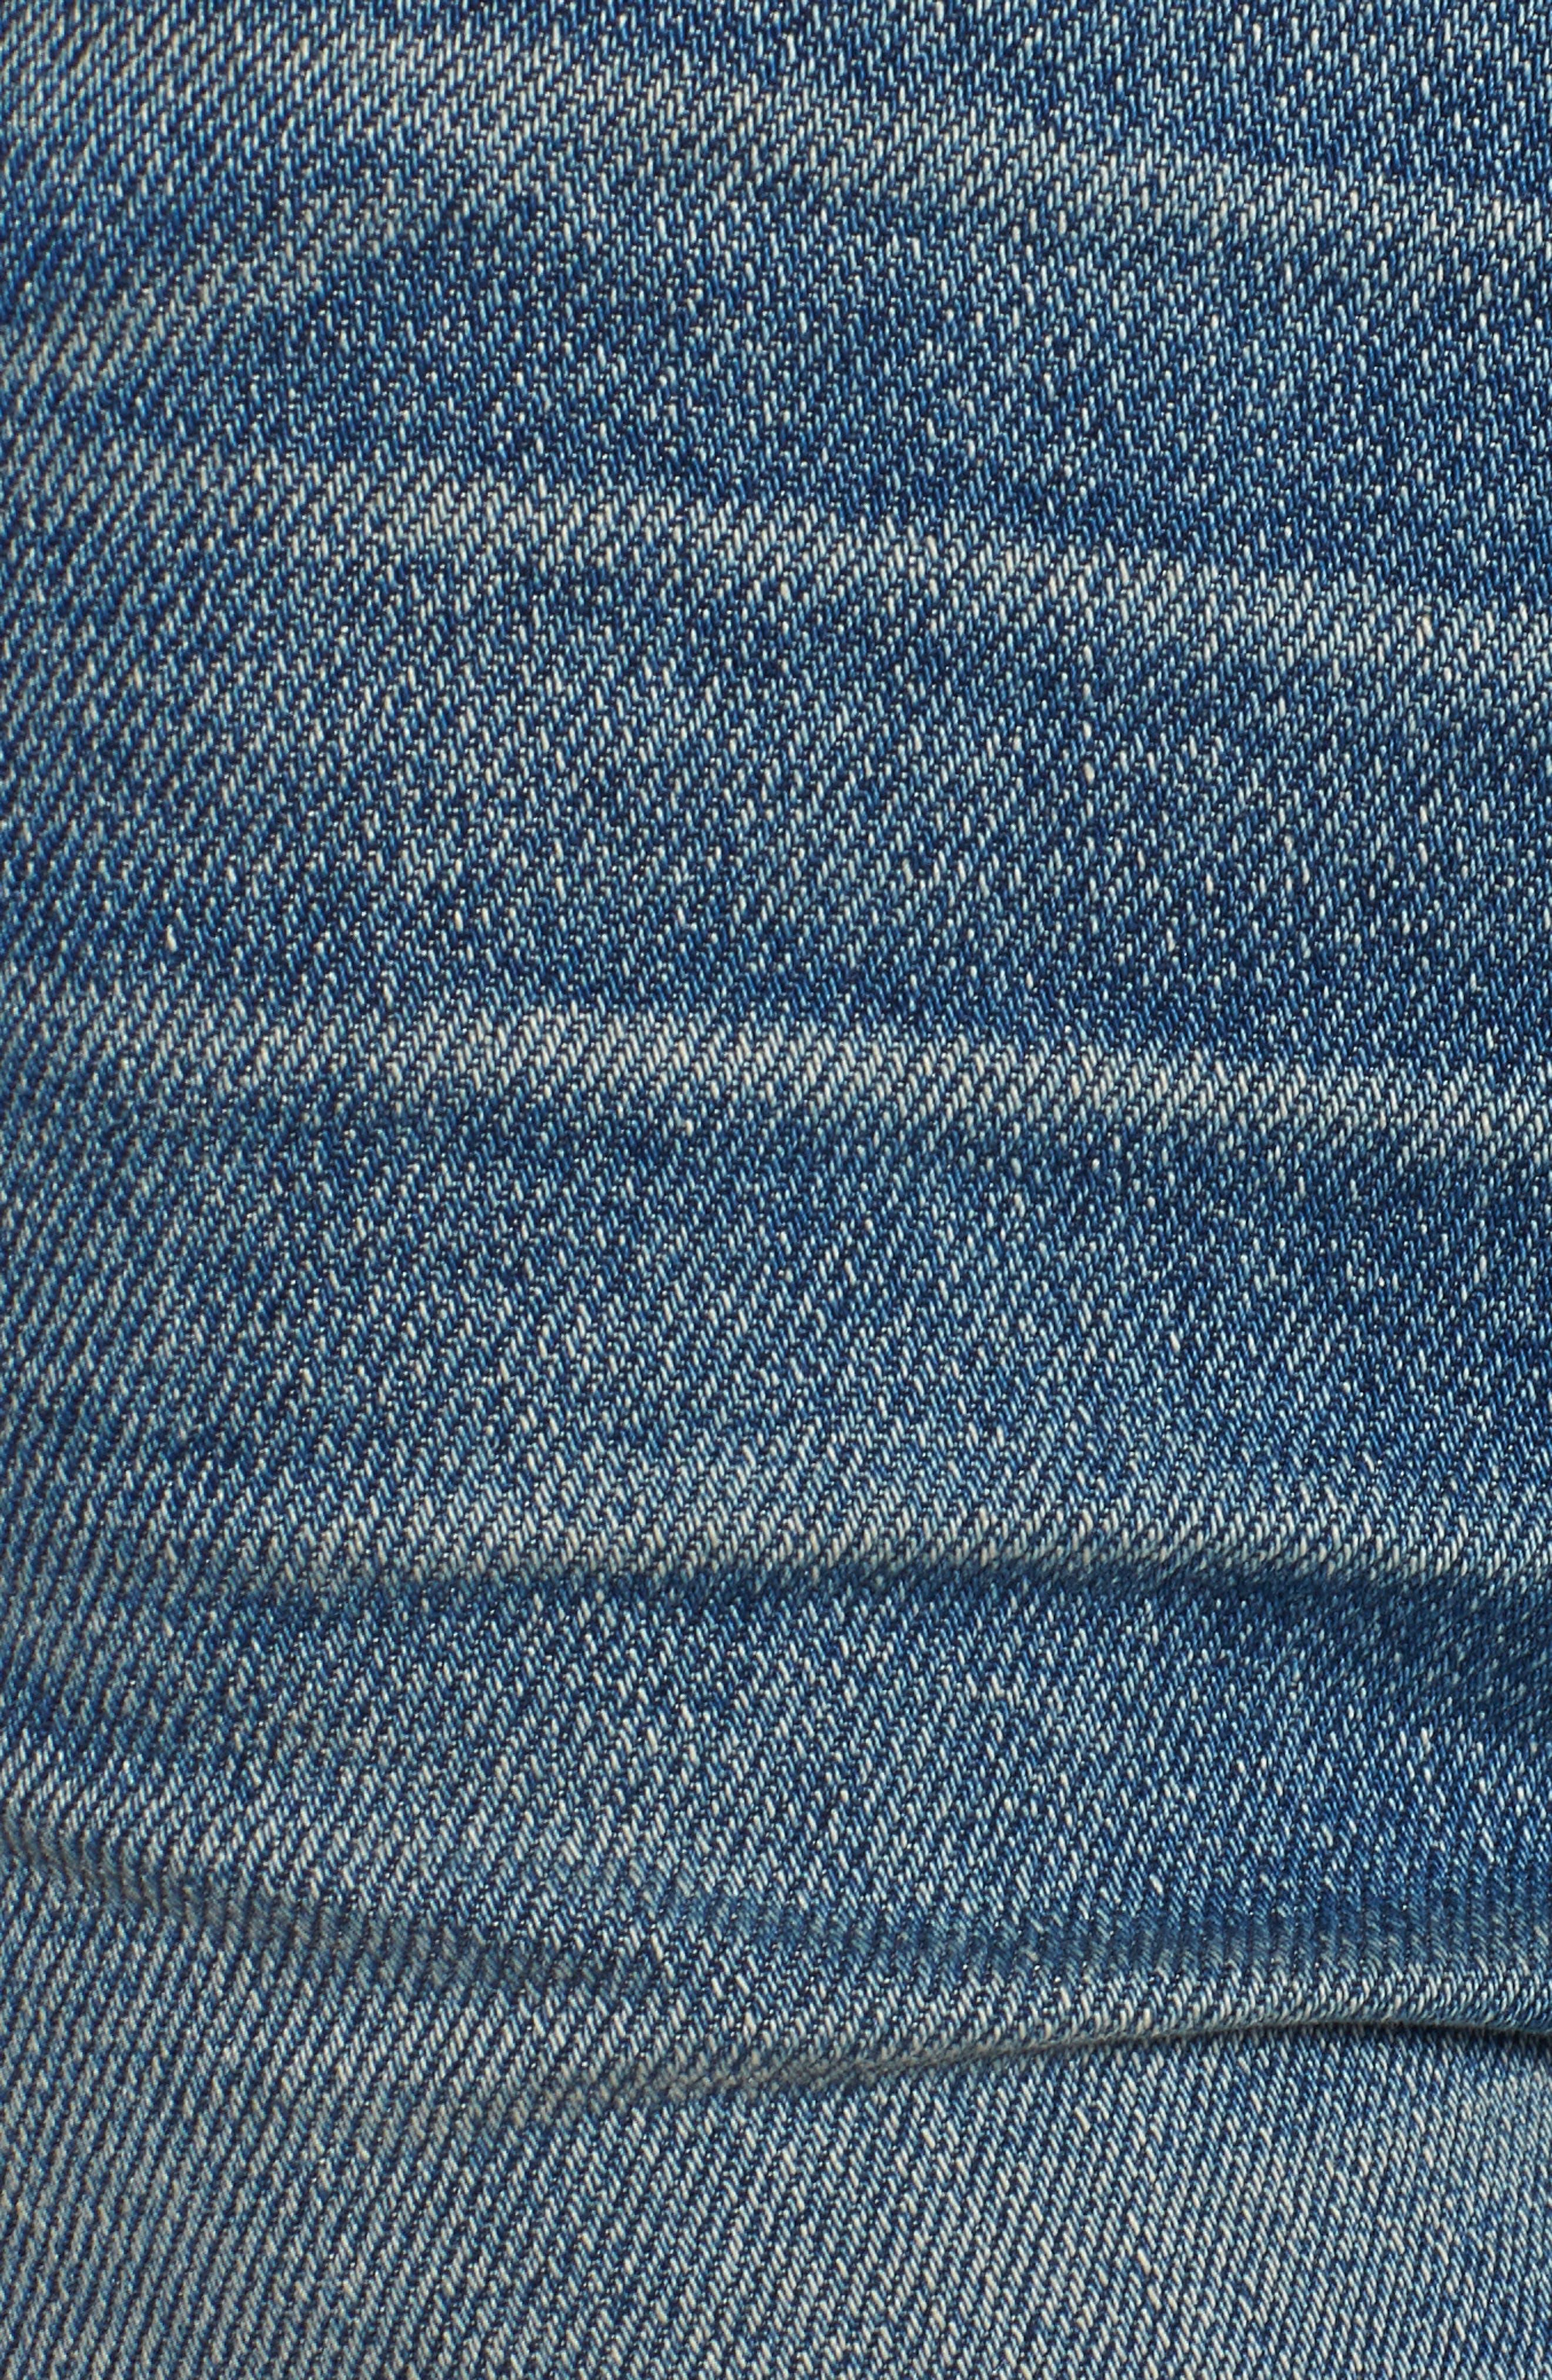 Sade Cutoff Denim Shorts,                             Alternate thumbnail 6, color,                             421